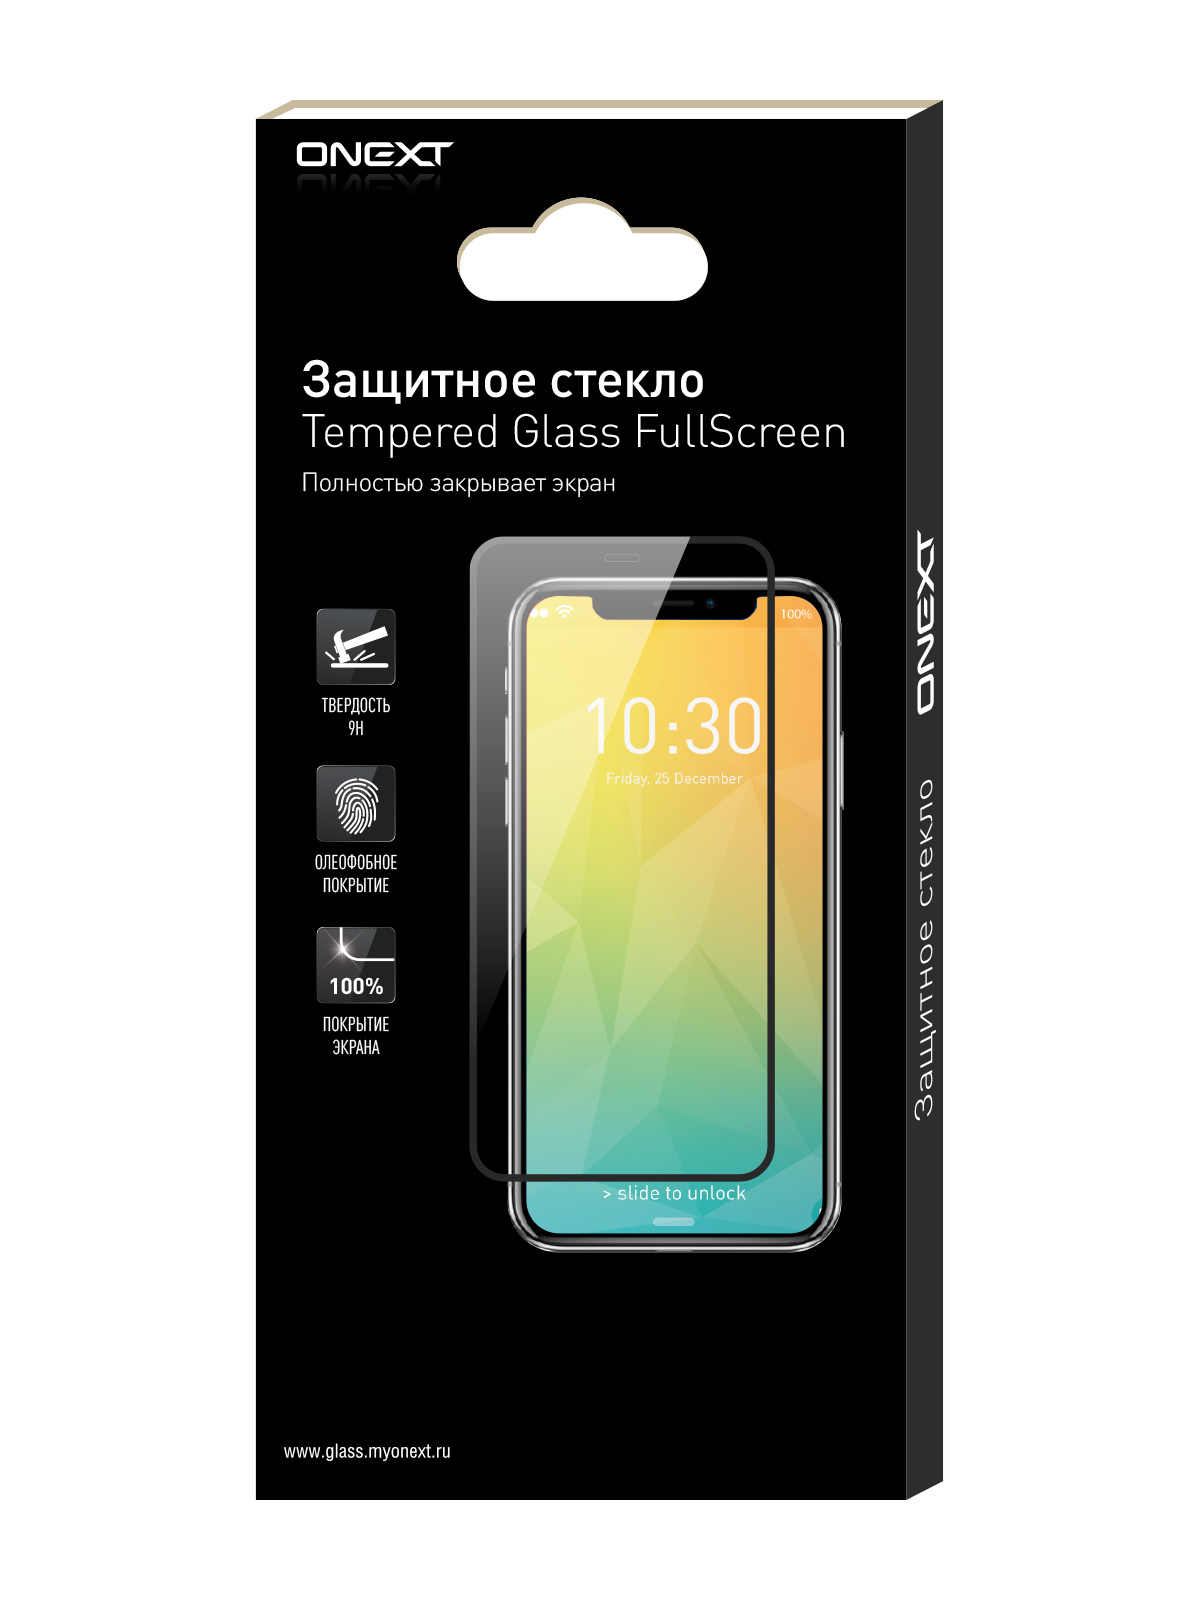 Защитное стекло ONEXT для Samsung Galaxy J5 Prime Black